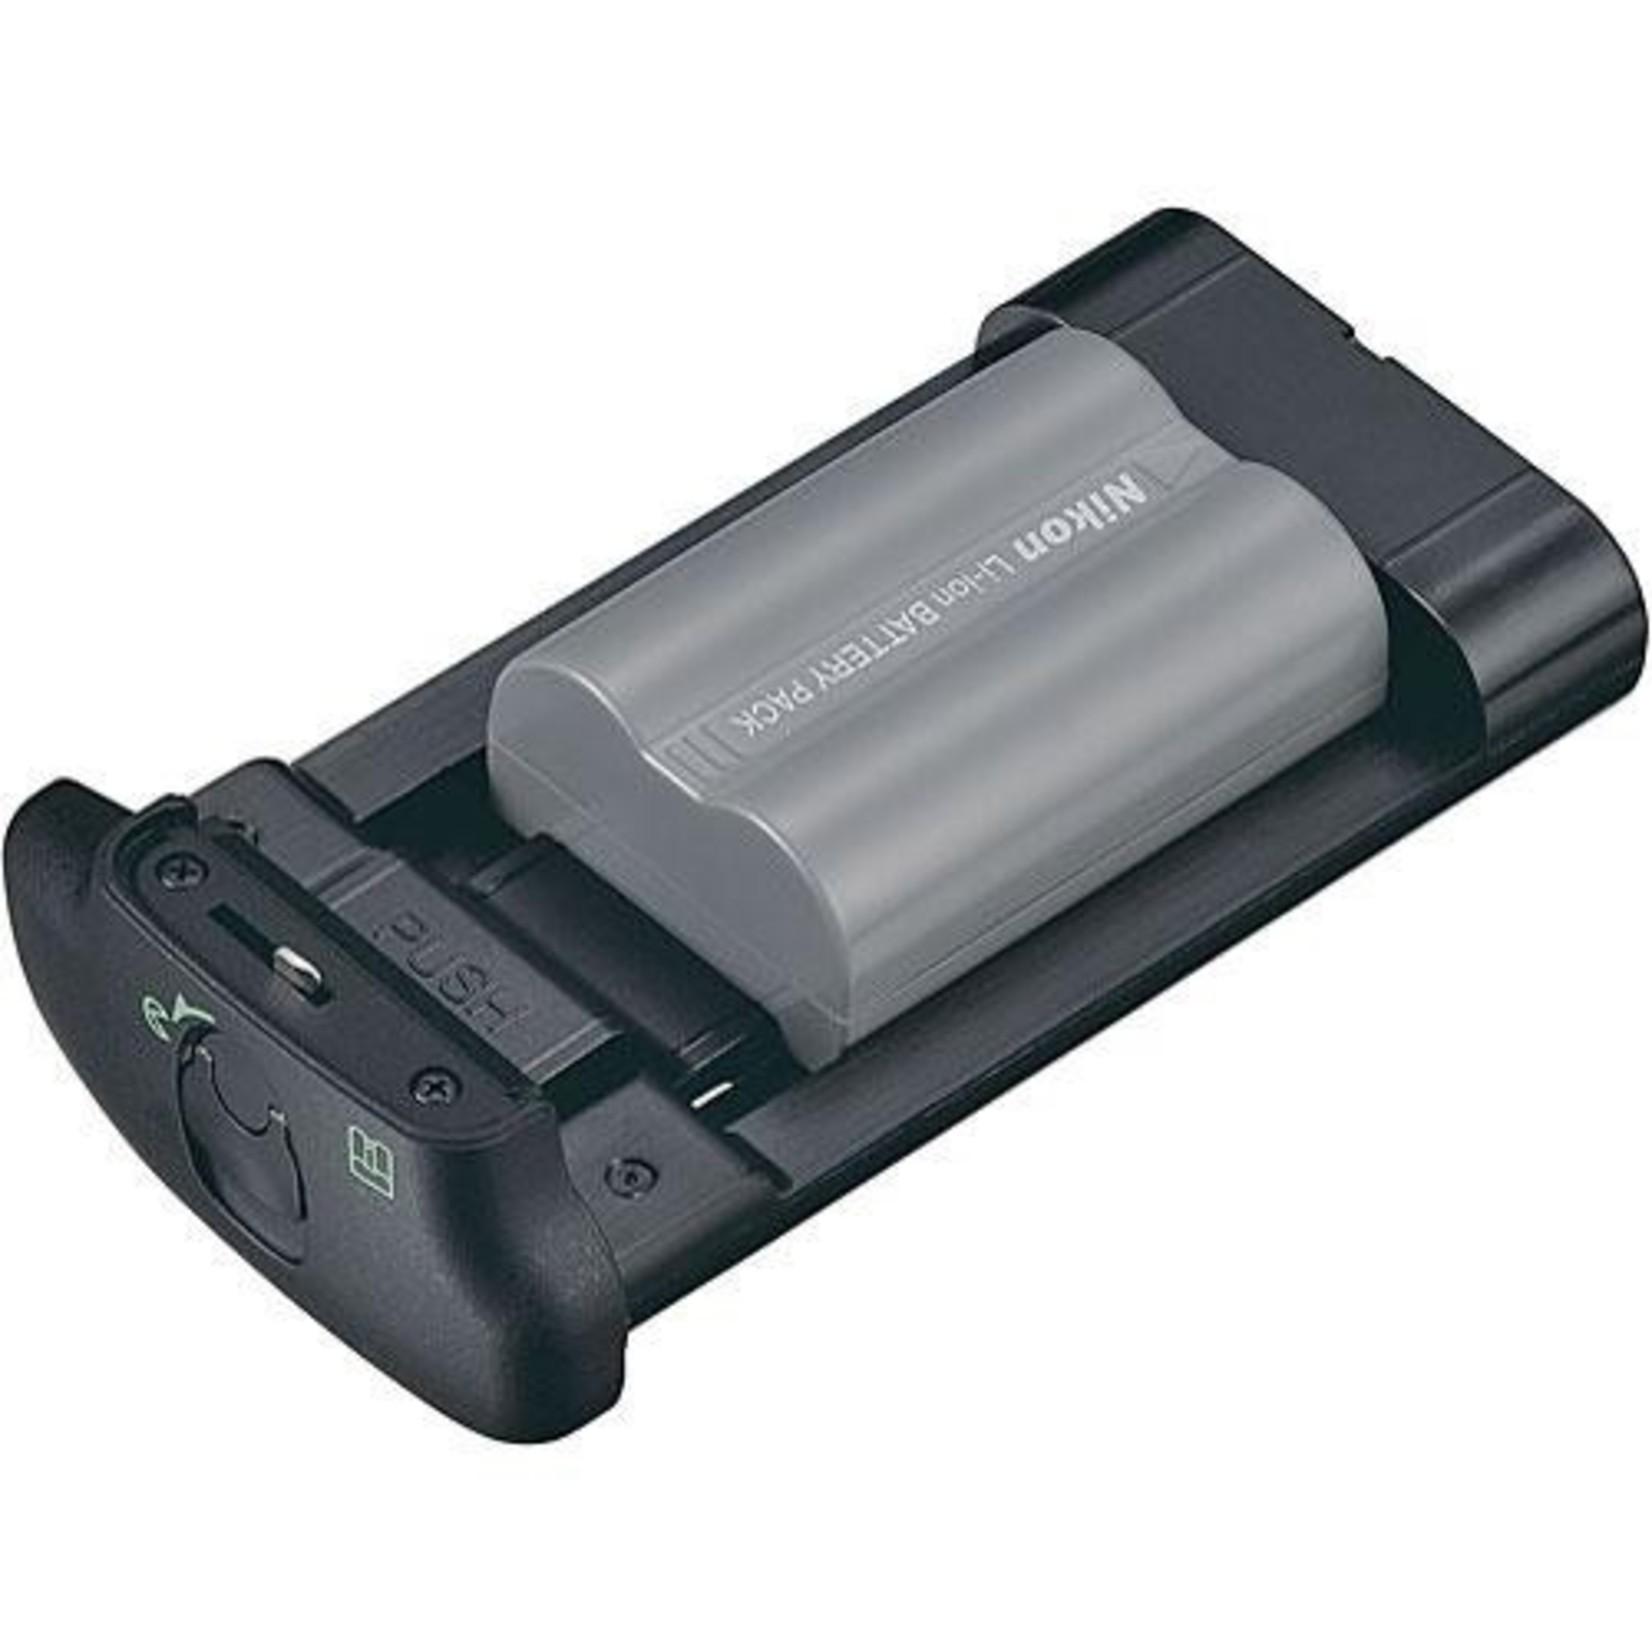 Nikon Nikon MS-D10EN for the MB-D10 Multi-Power Battery Pack